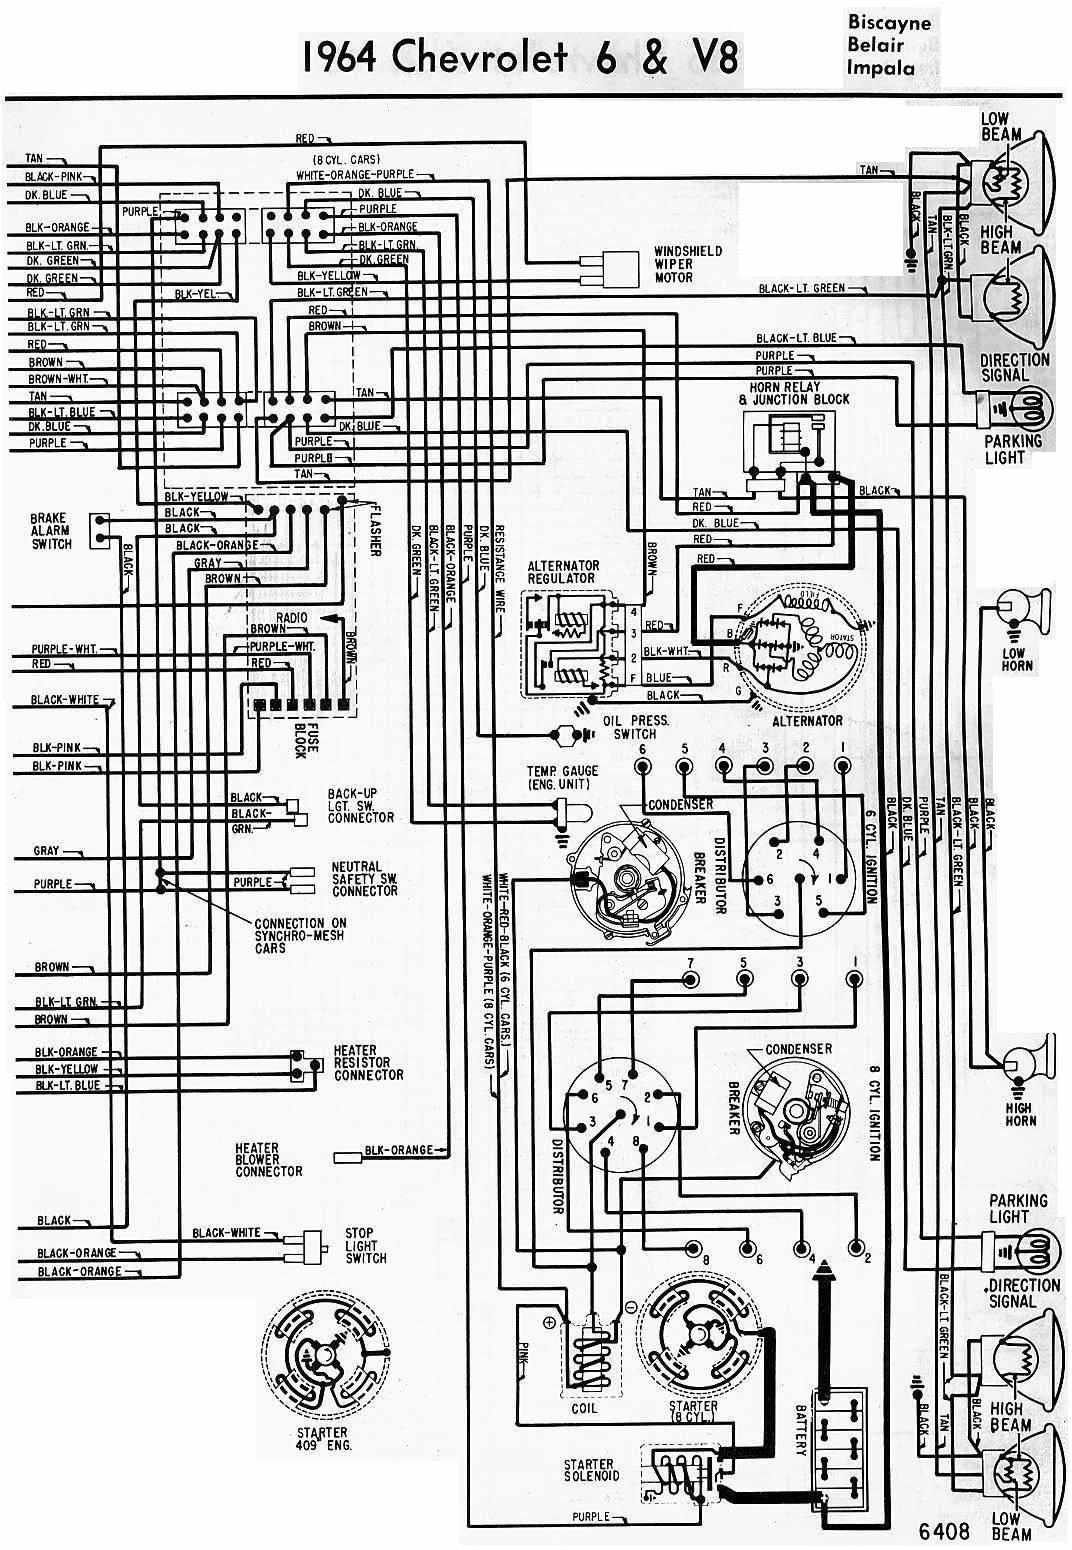 Outstanding Peterbilt 379 Cab Wiring Diagram Crest - Wiring Diagram ...